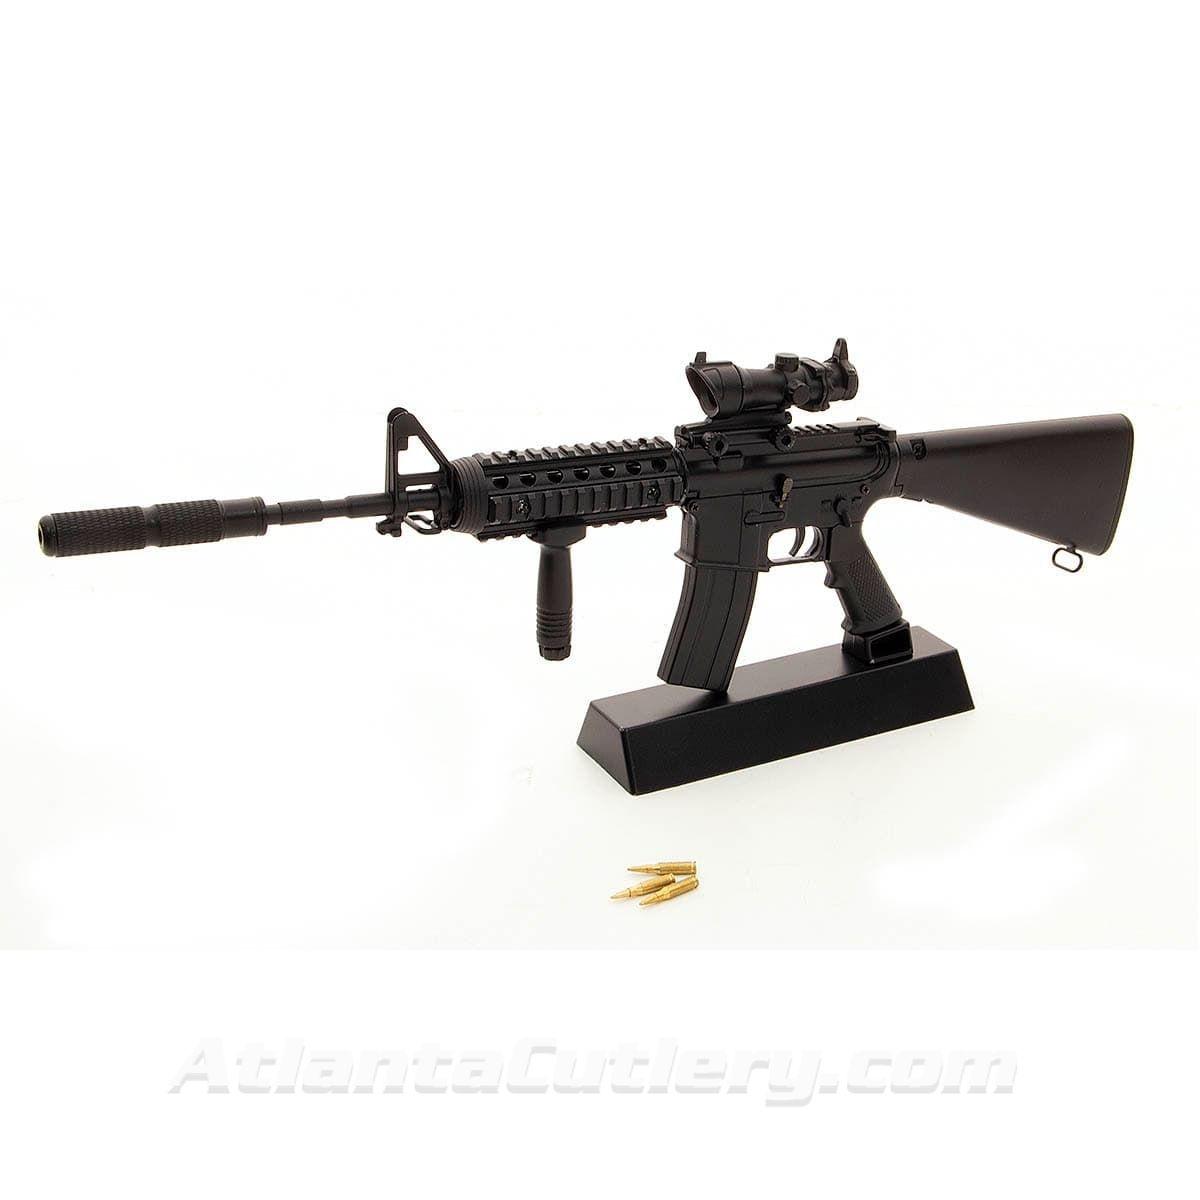 Miniature M16 Toy Model Fugazi on Trophy Stand